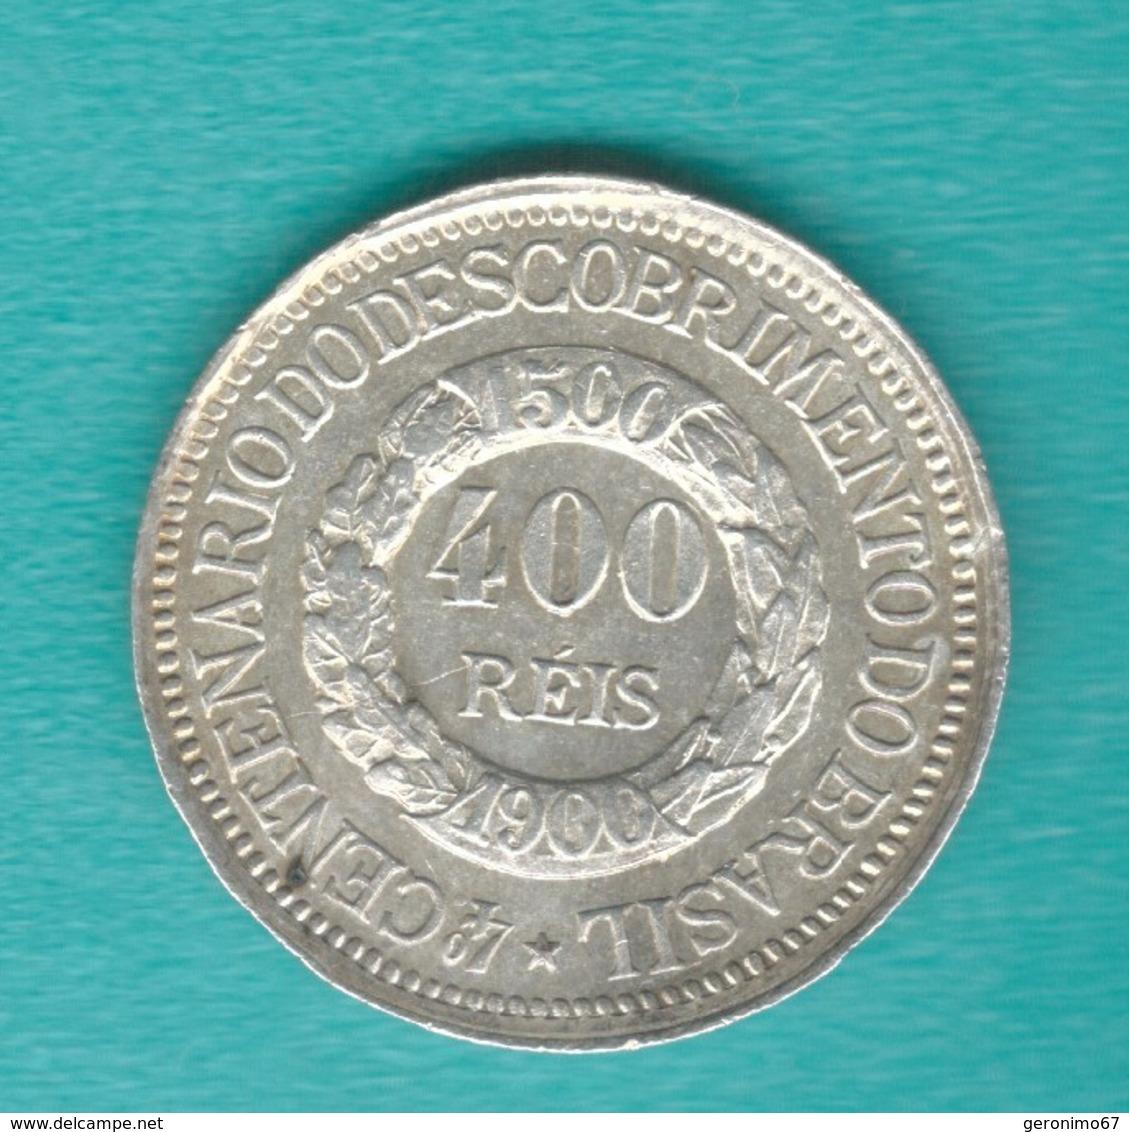 Brazil - 400 Réis - 1900 - 400th Anniversary Of The Discovery Of Brazil - KM499 - Brésil